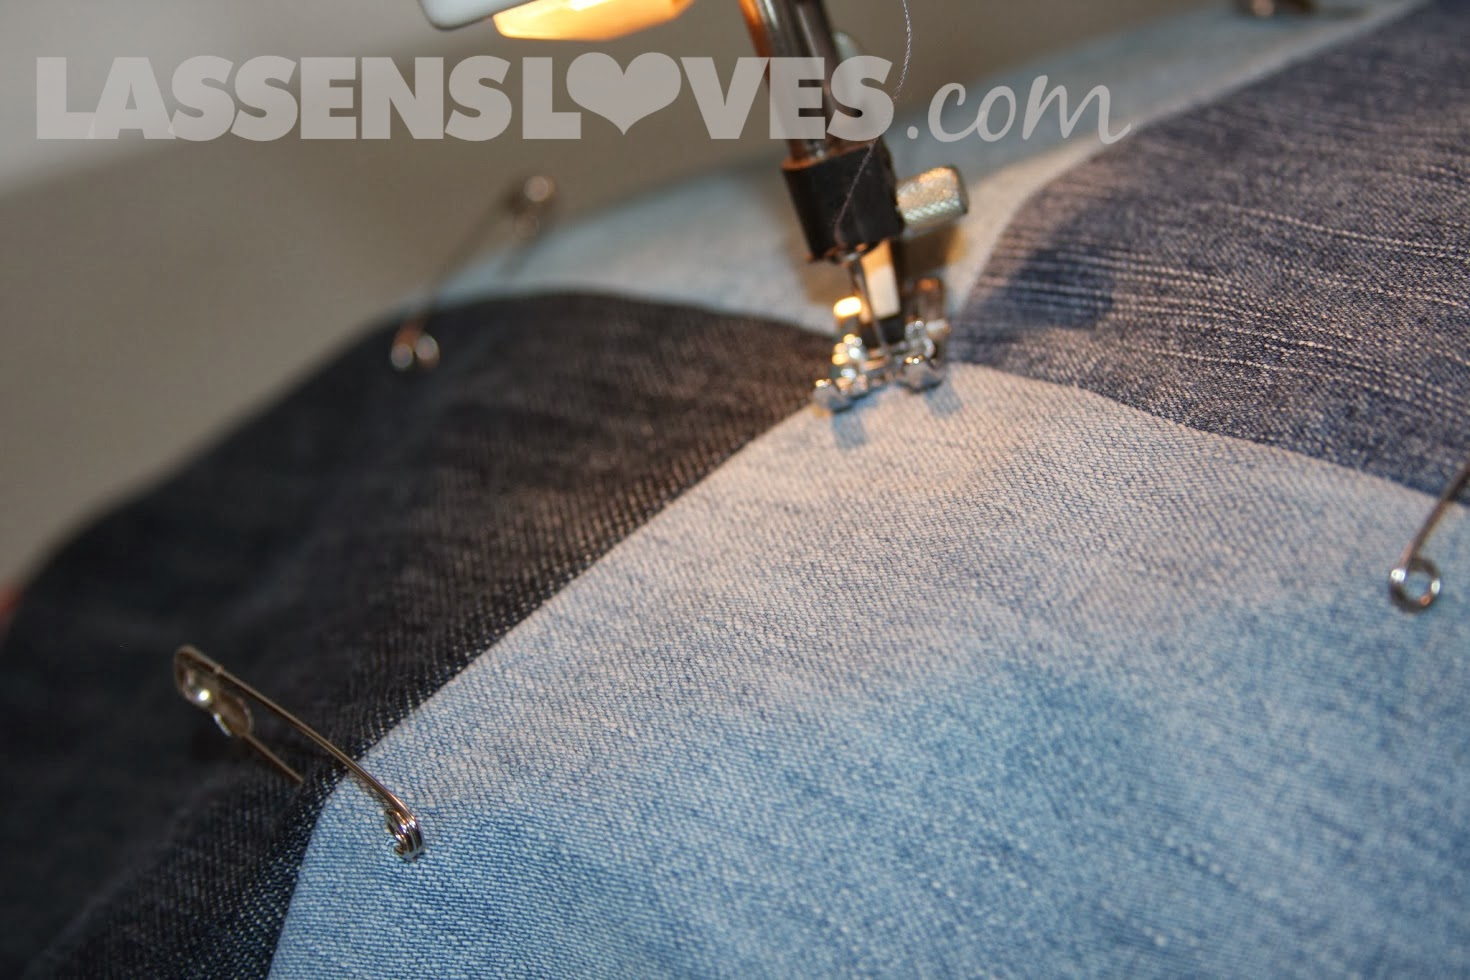 lassensloves.com, Lassen's, Lassens, jeans+blanket, denim+blanket, up+cycle